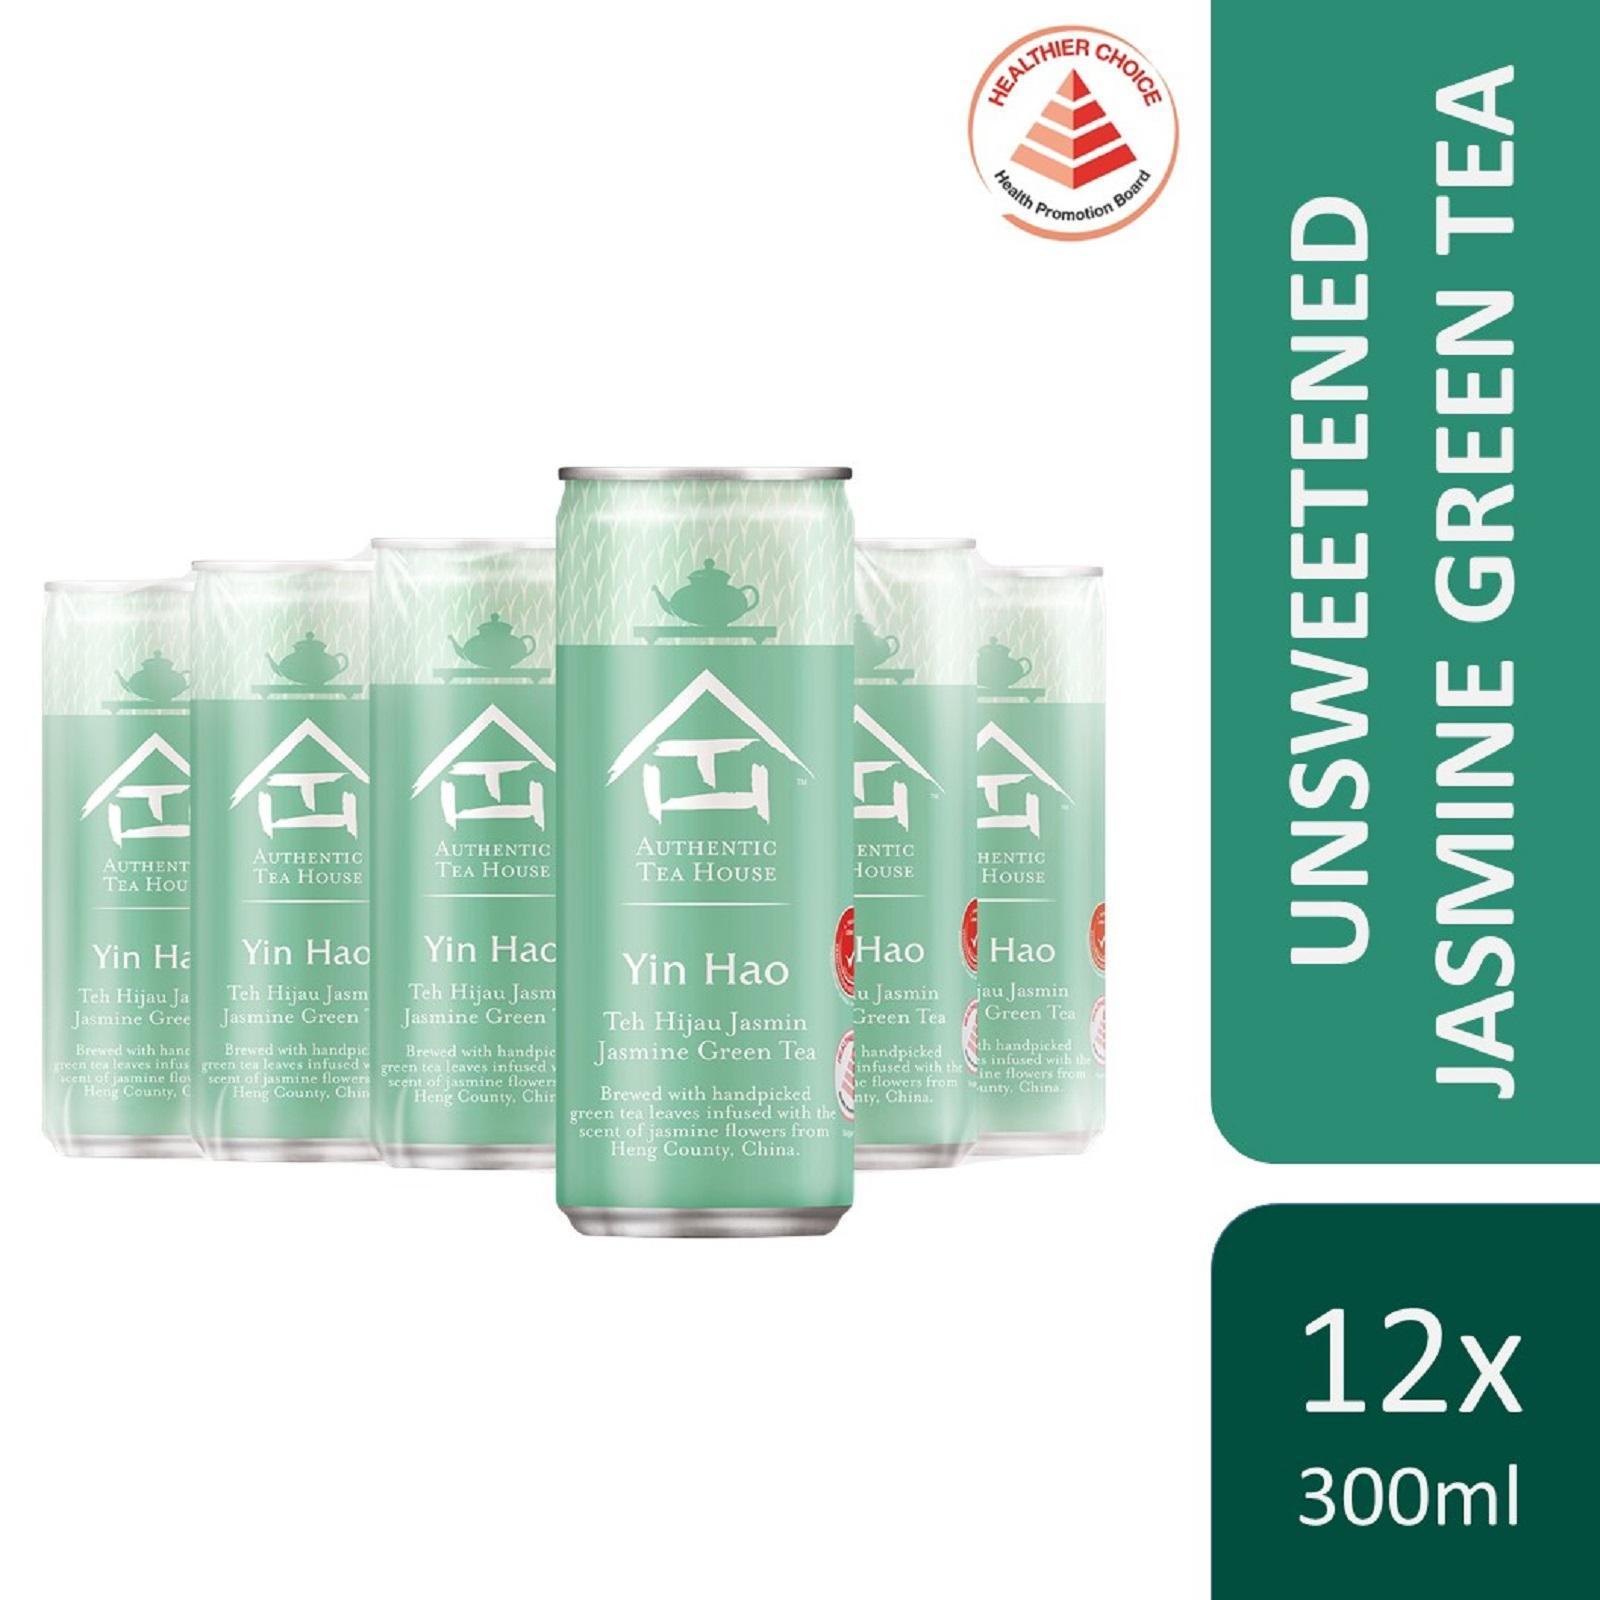 Authentic Tea House Yin Hao Unsweetened Jasmine Green Tea (12 x 300ml) - Case